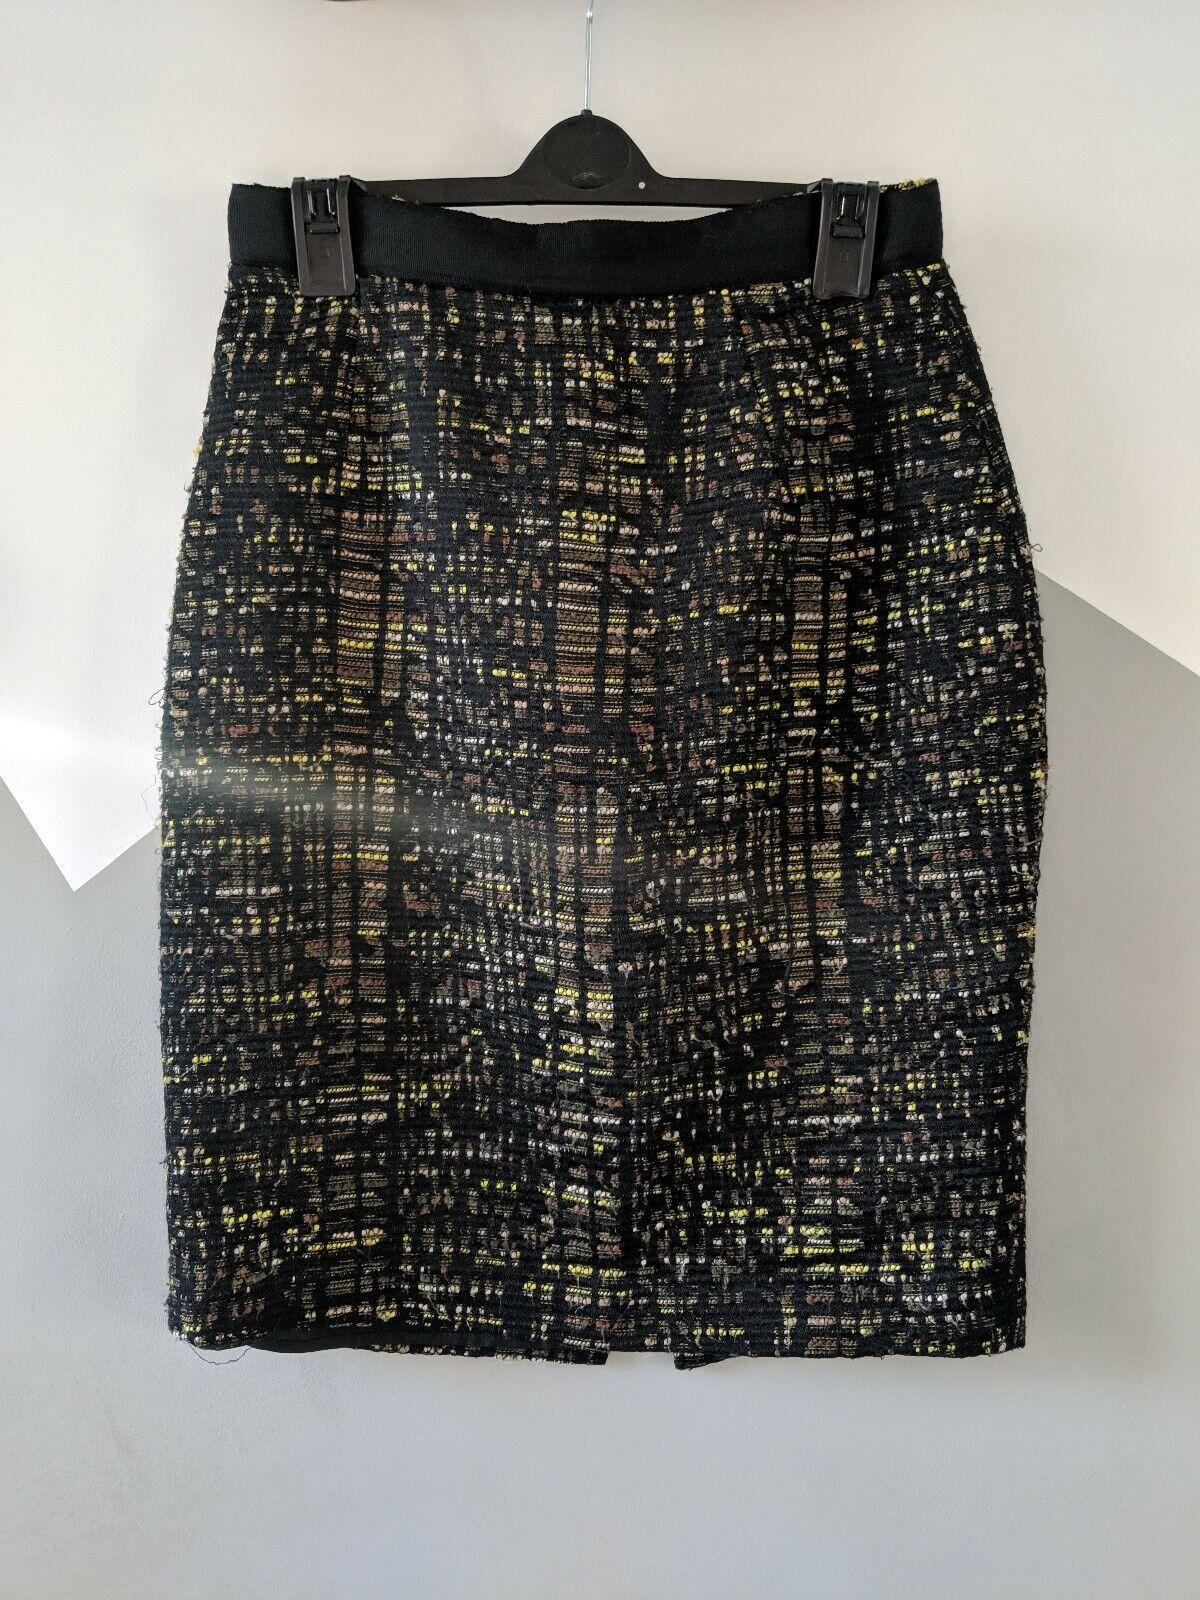 RUNWAY  CLEMENTS RIBEIRO Yellow Green Boucle Tweed High-Waist Pencil Skirt S